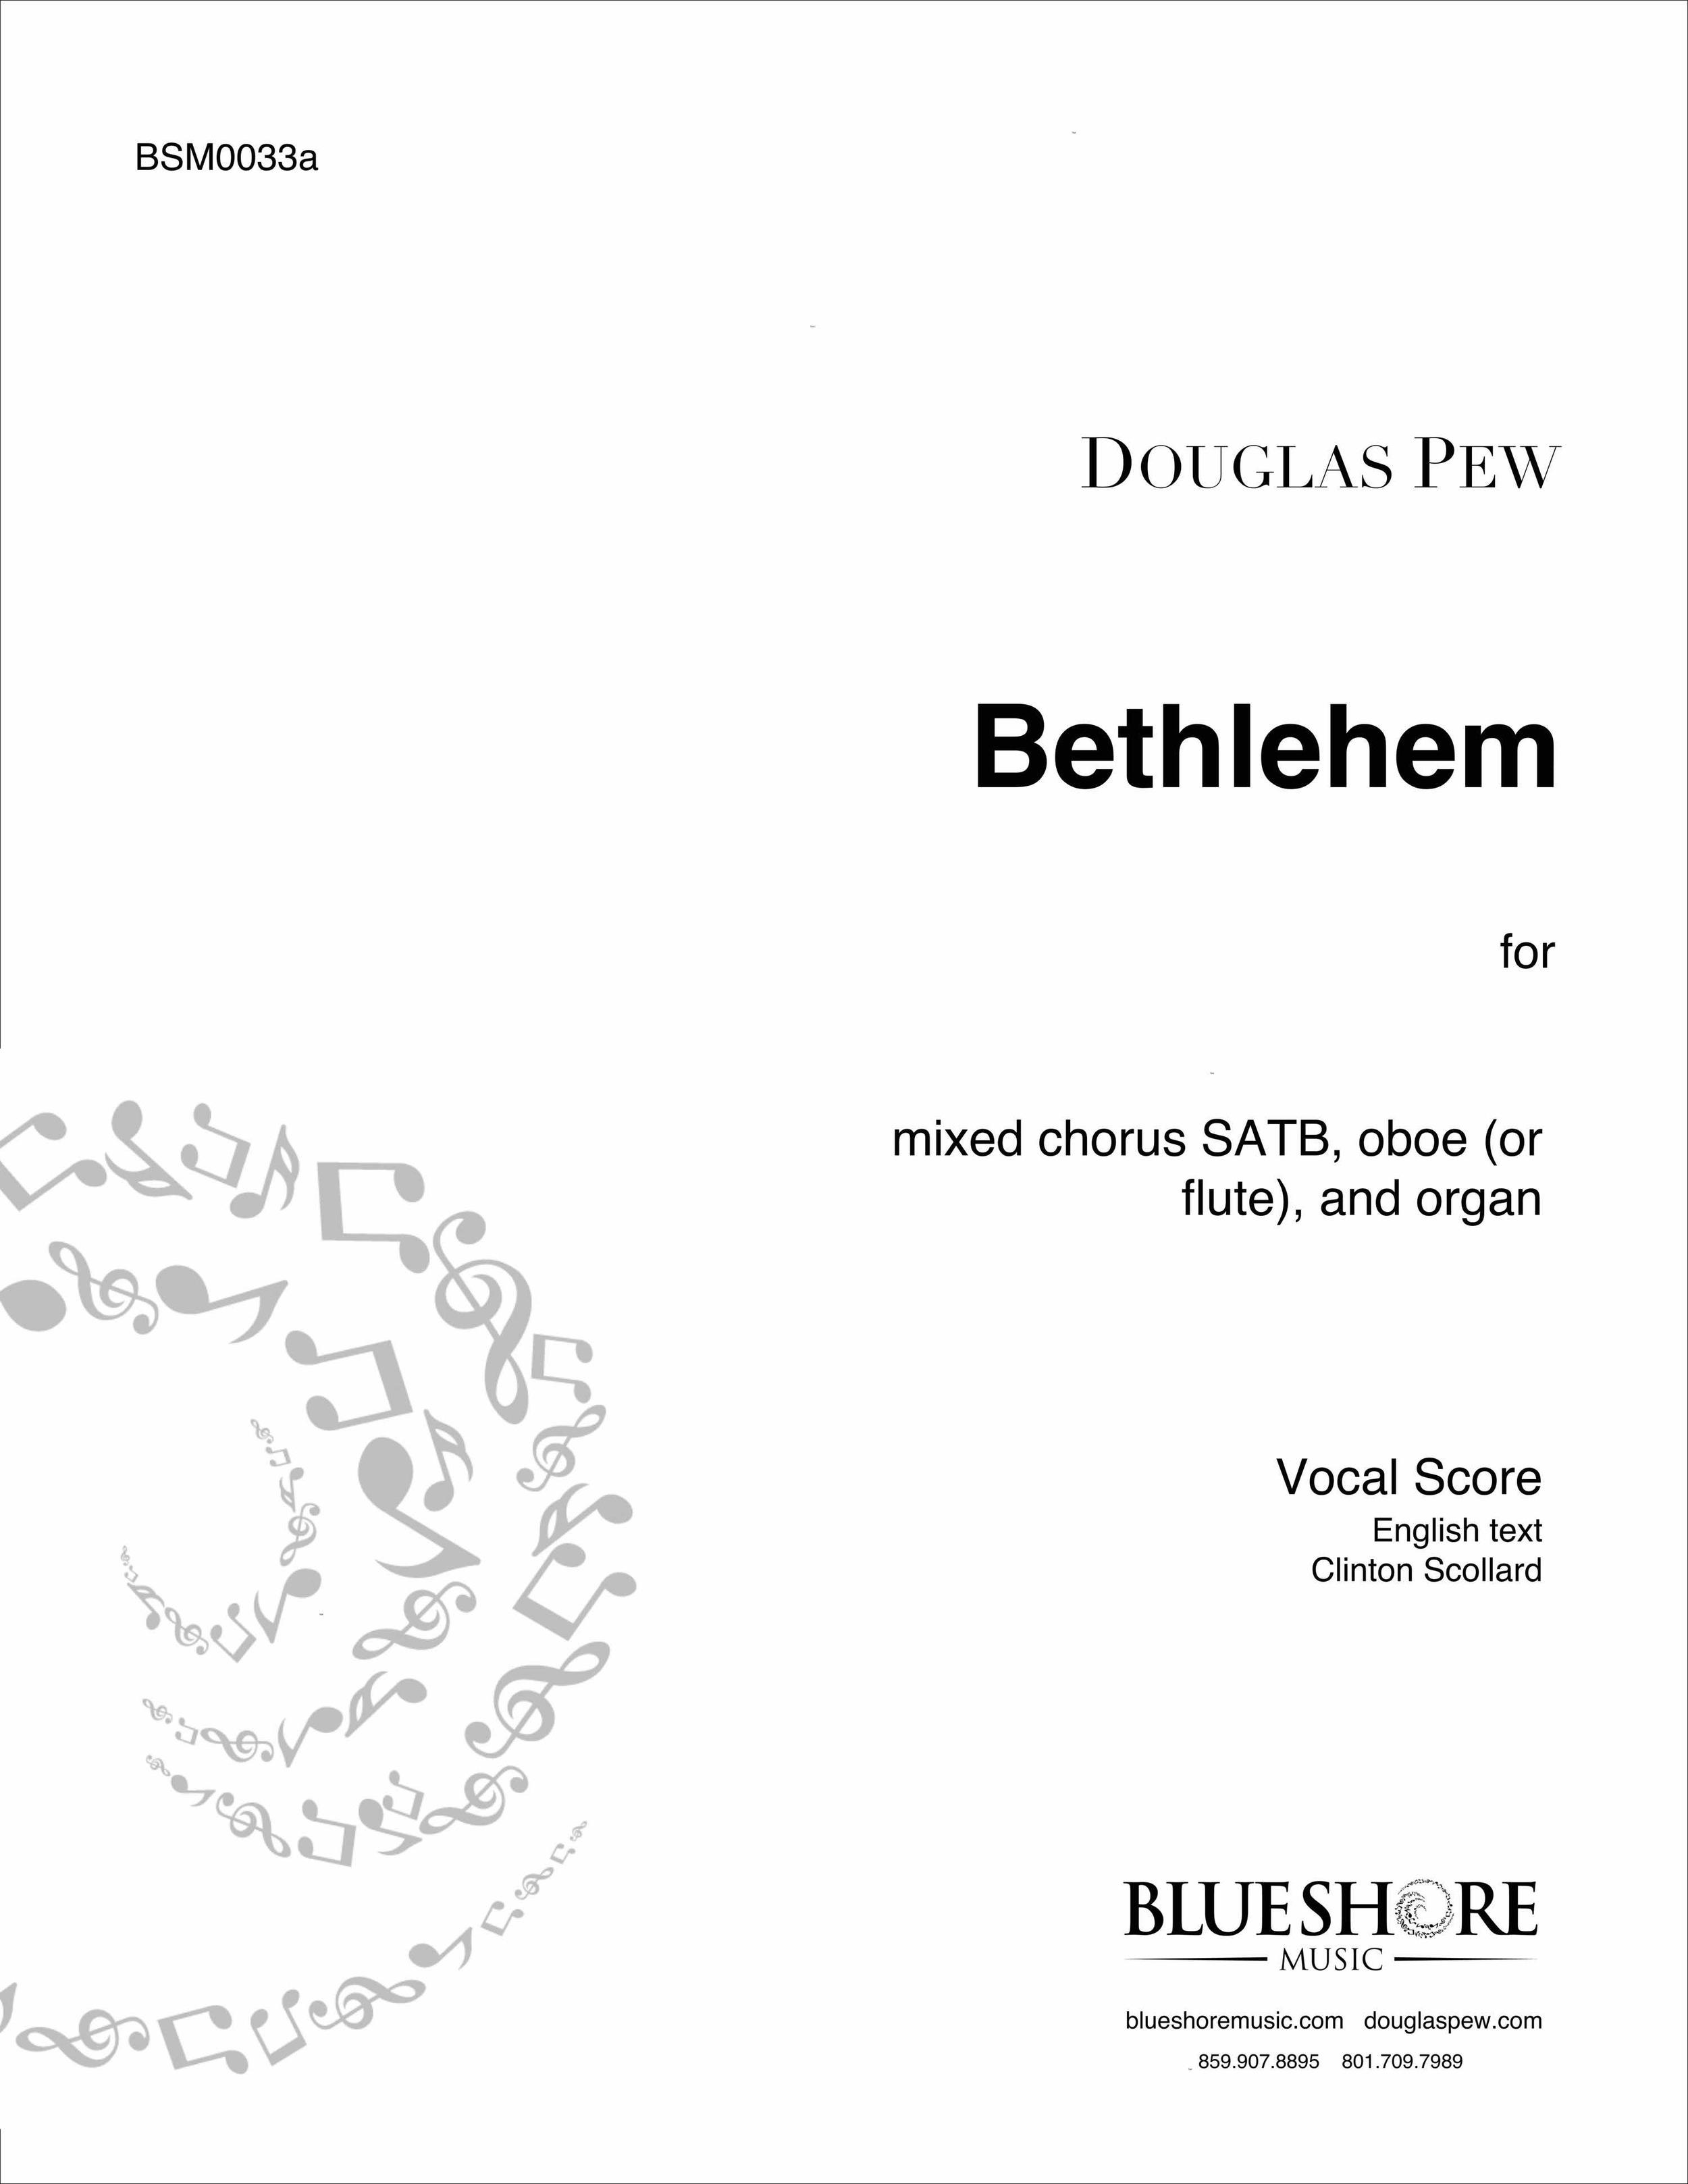 Bethlehem  - SATB, Oboe (or Flute), and Organ